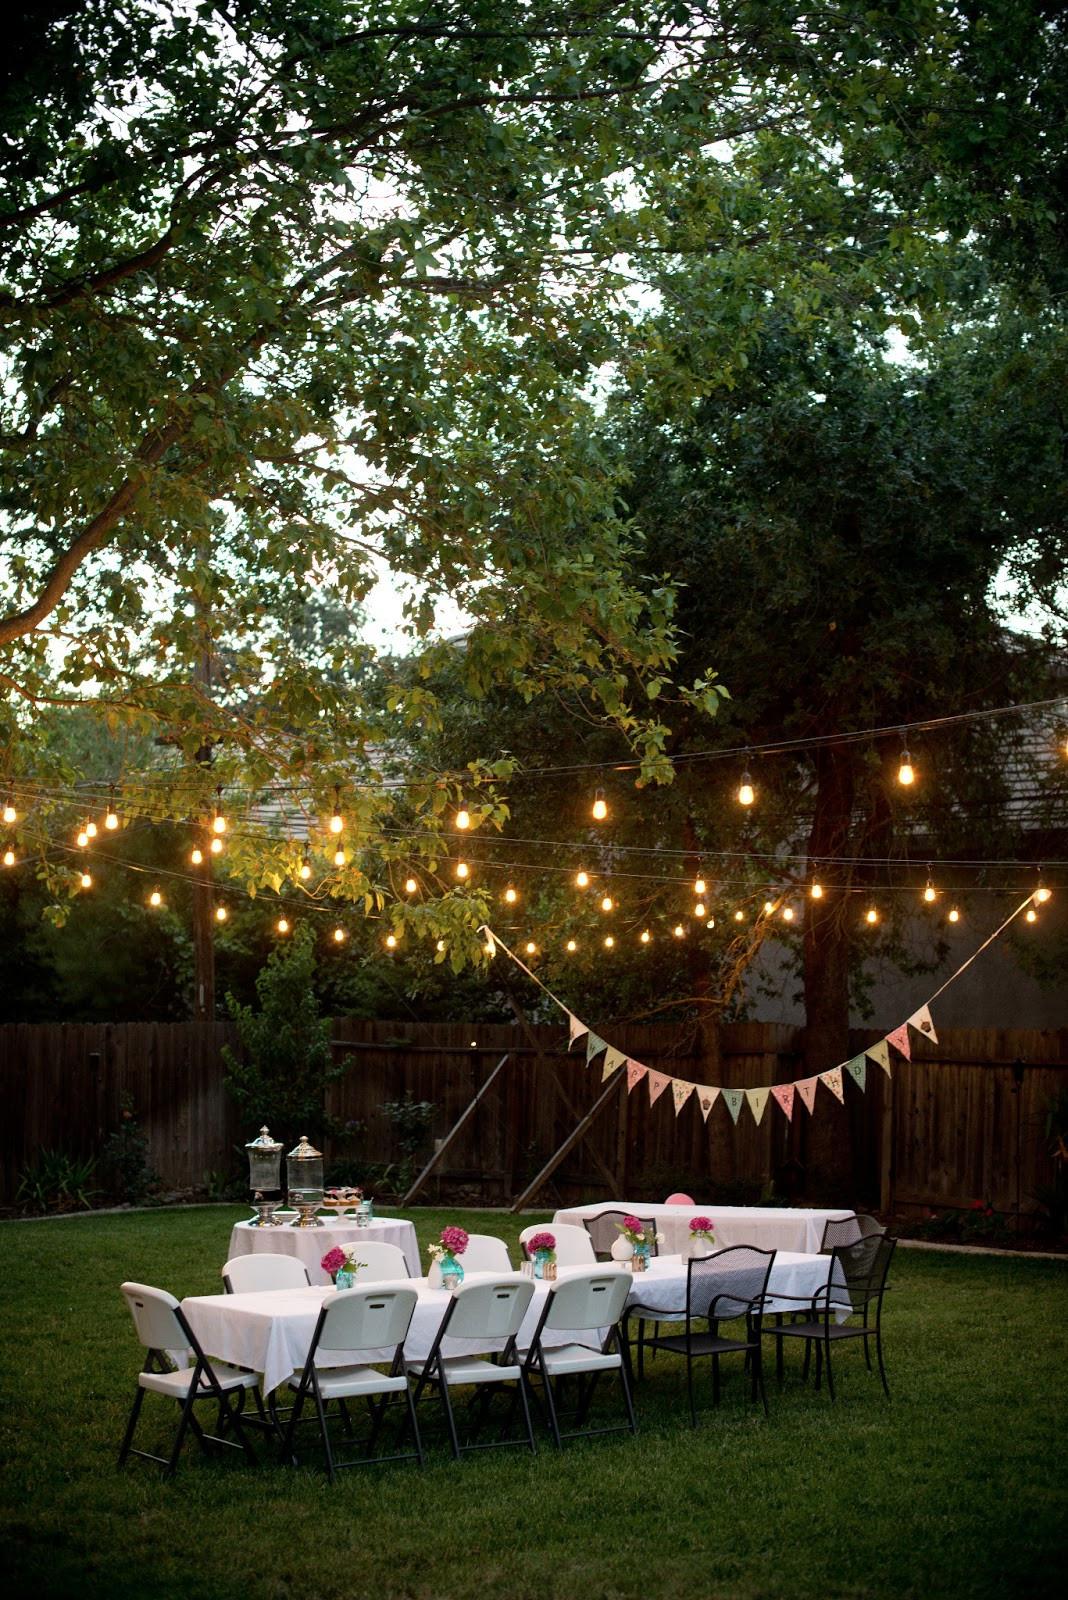 Backyard Party Lighting Ideas  Domestic Fashionista Backyard Birthday Fun Pink